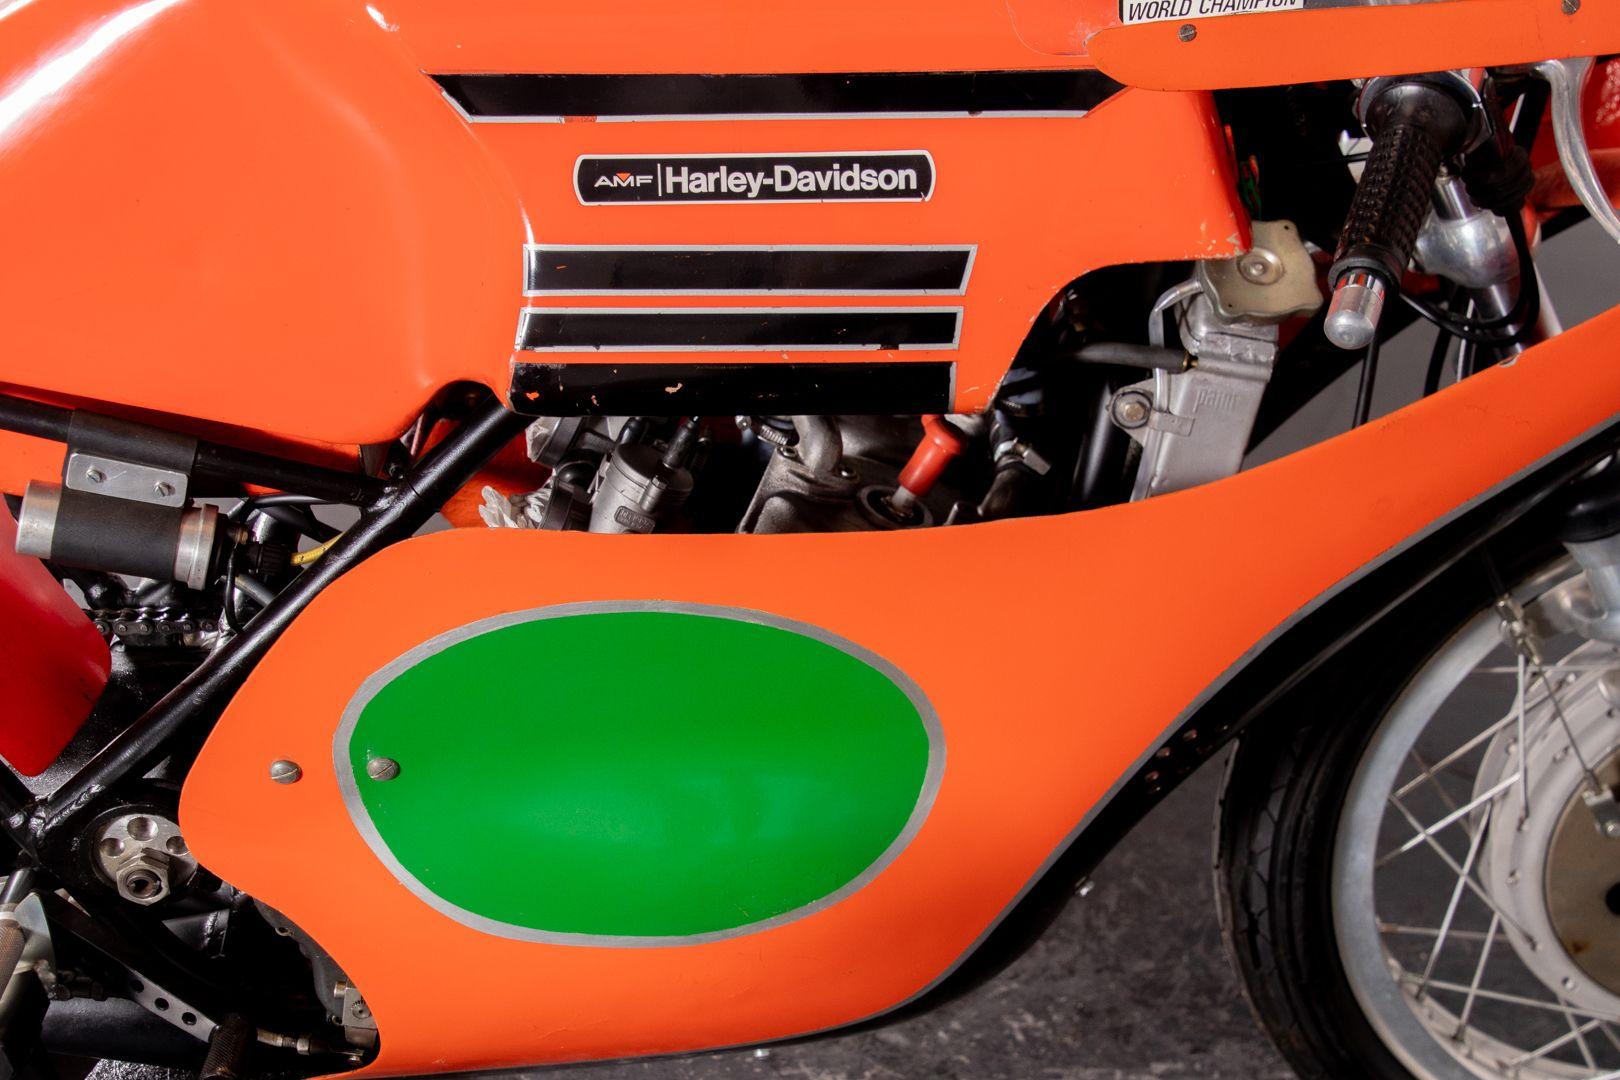 1974 HARLEY DAVIDSON 250 RR 51566